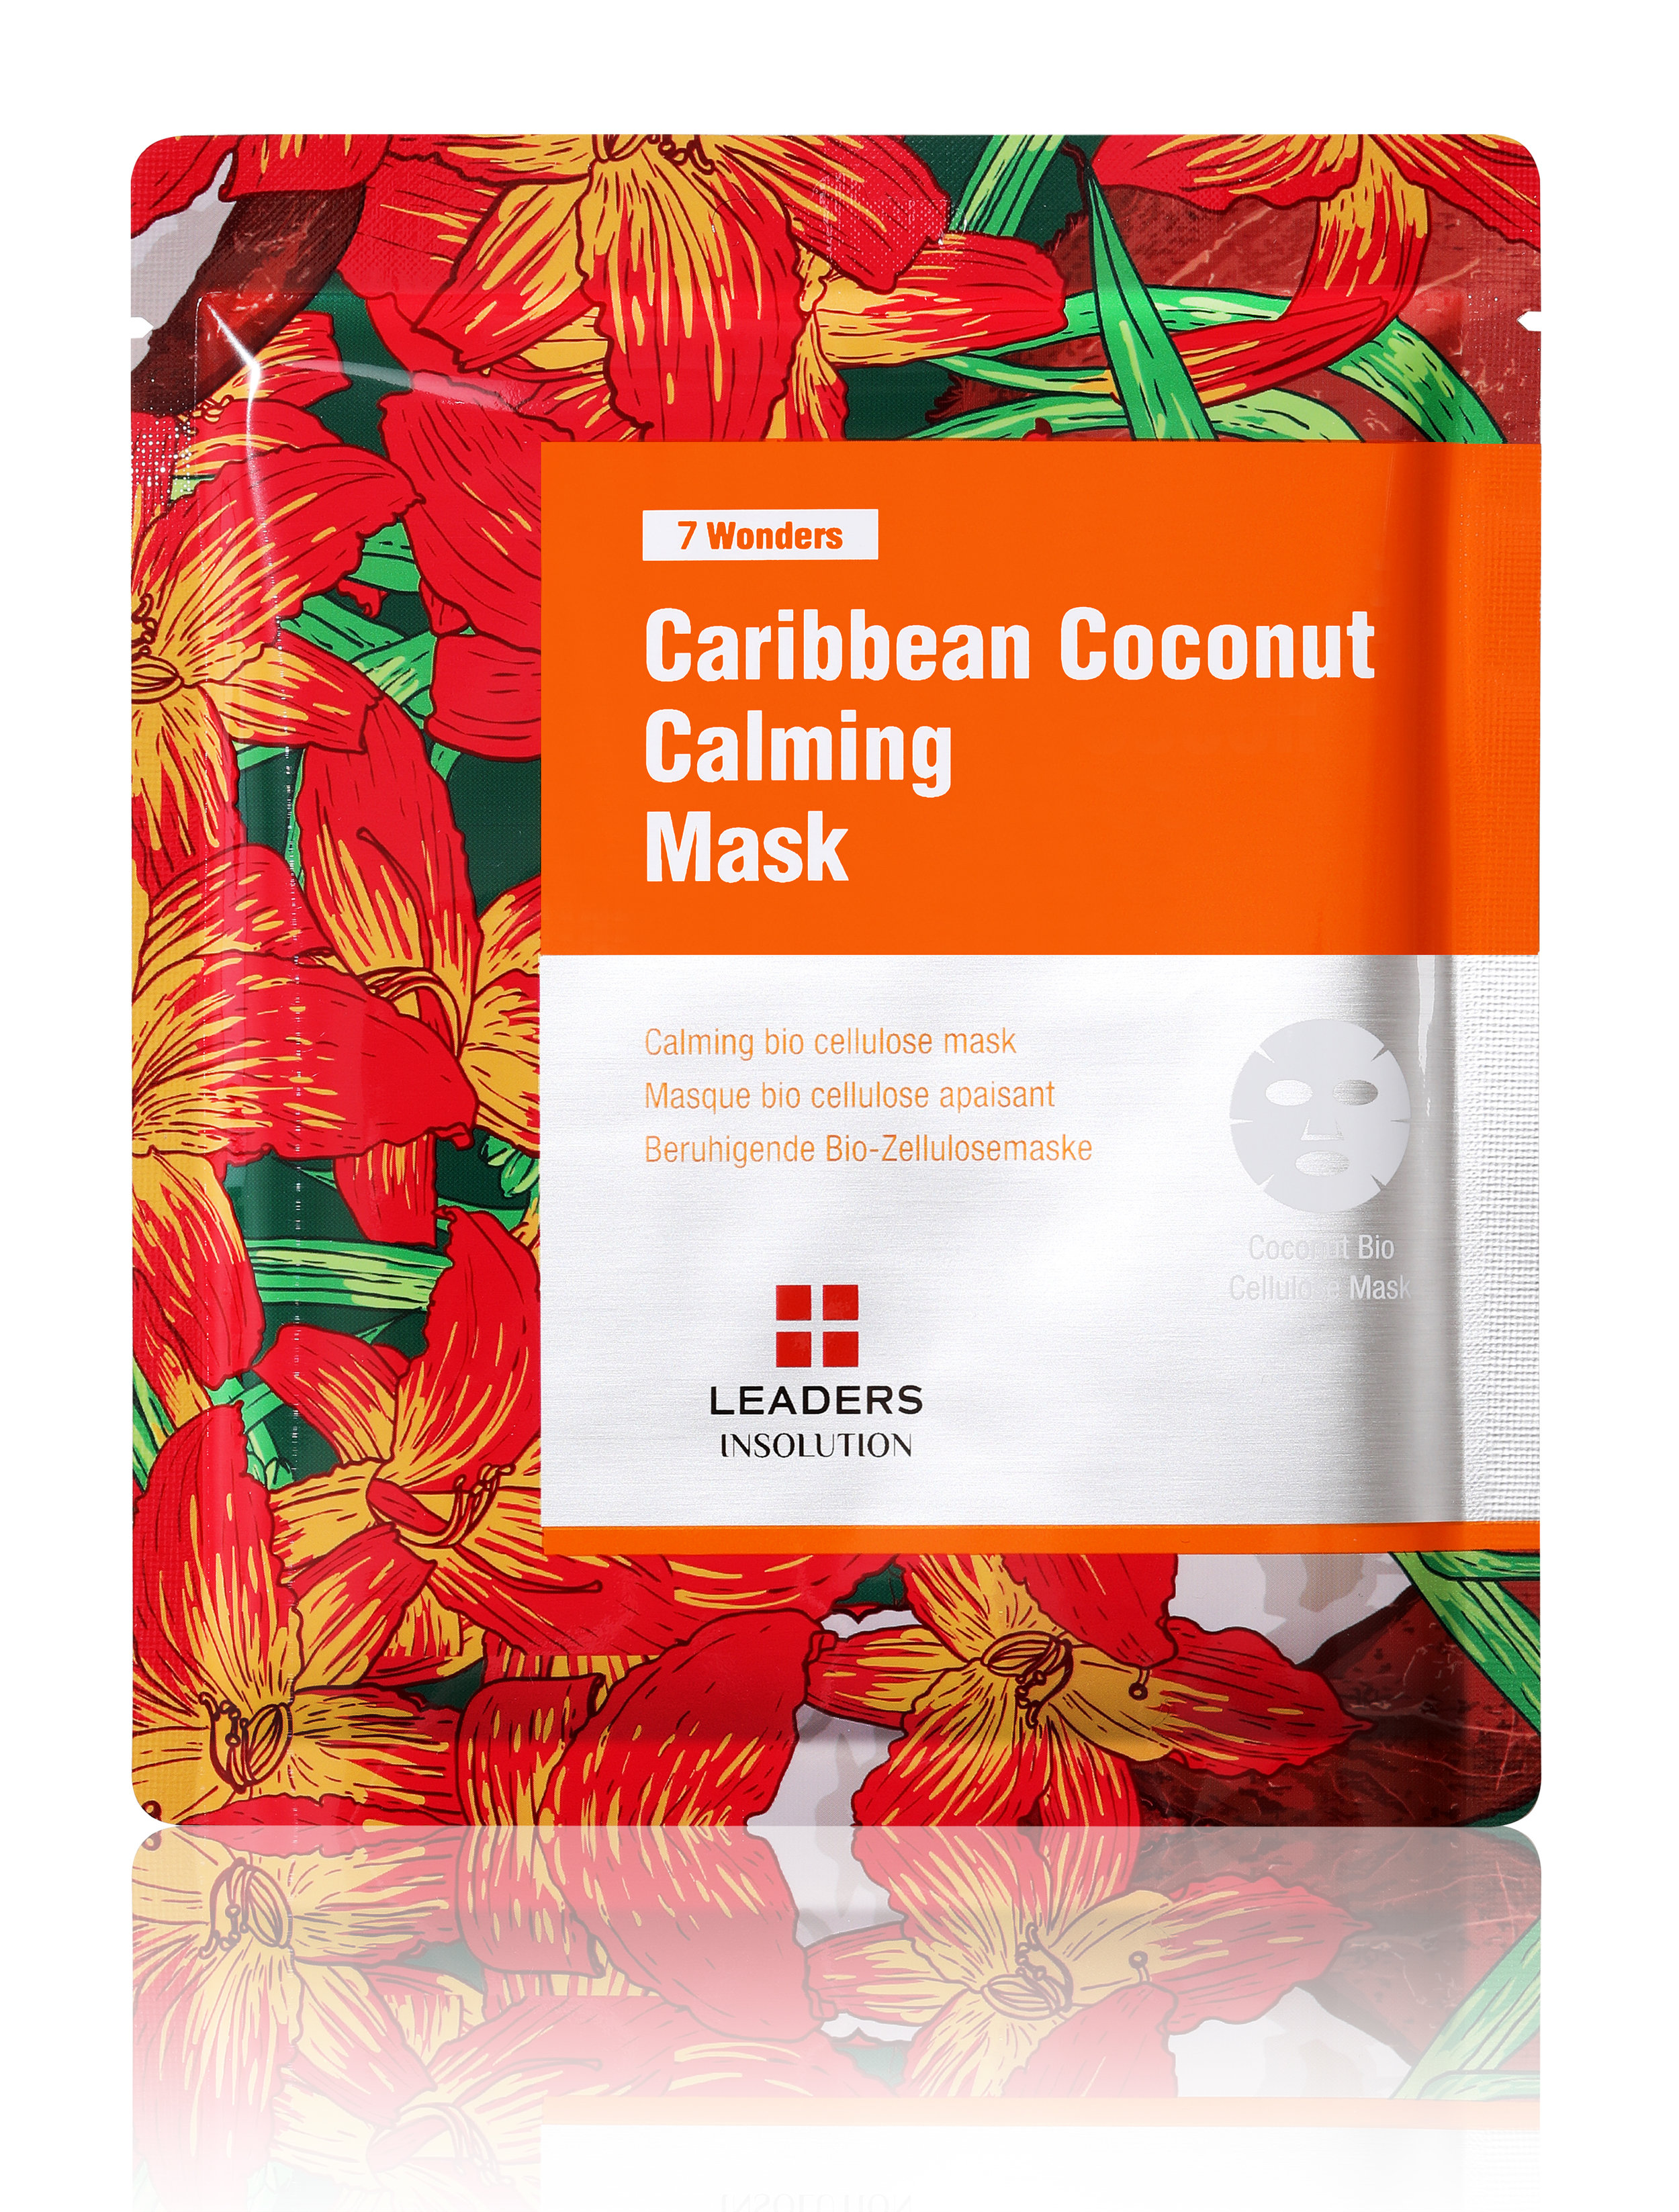 Insolution_7wonders_Carribean coconut_UNI_파우치_전면.jpg